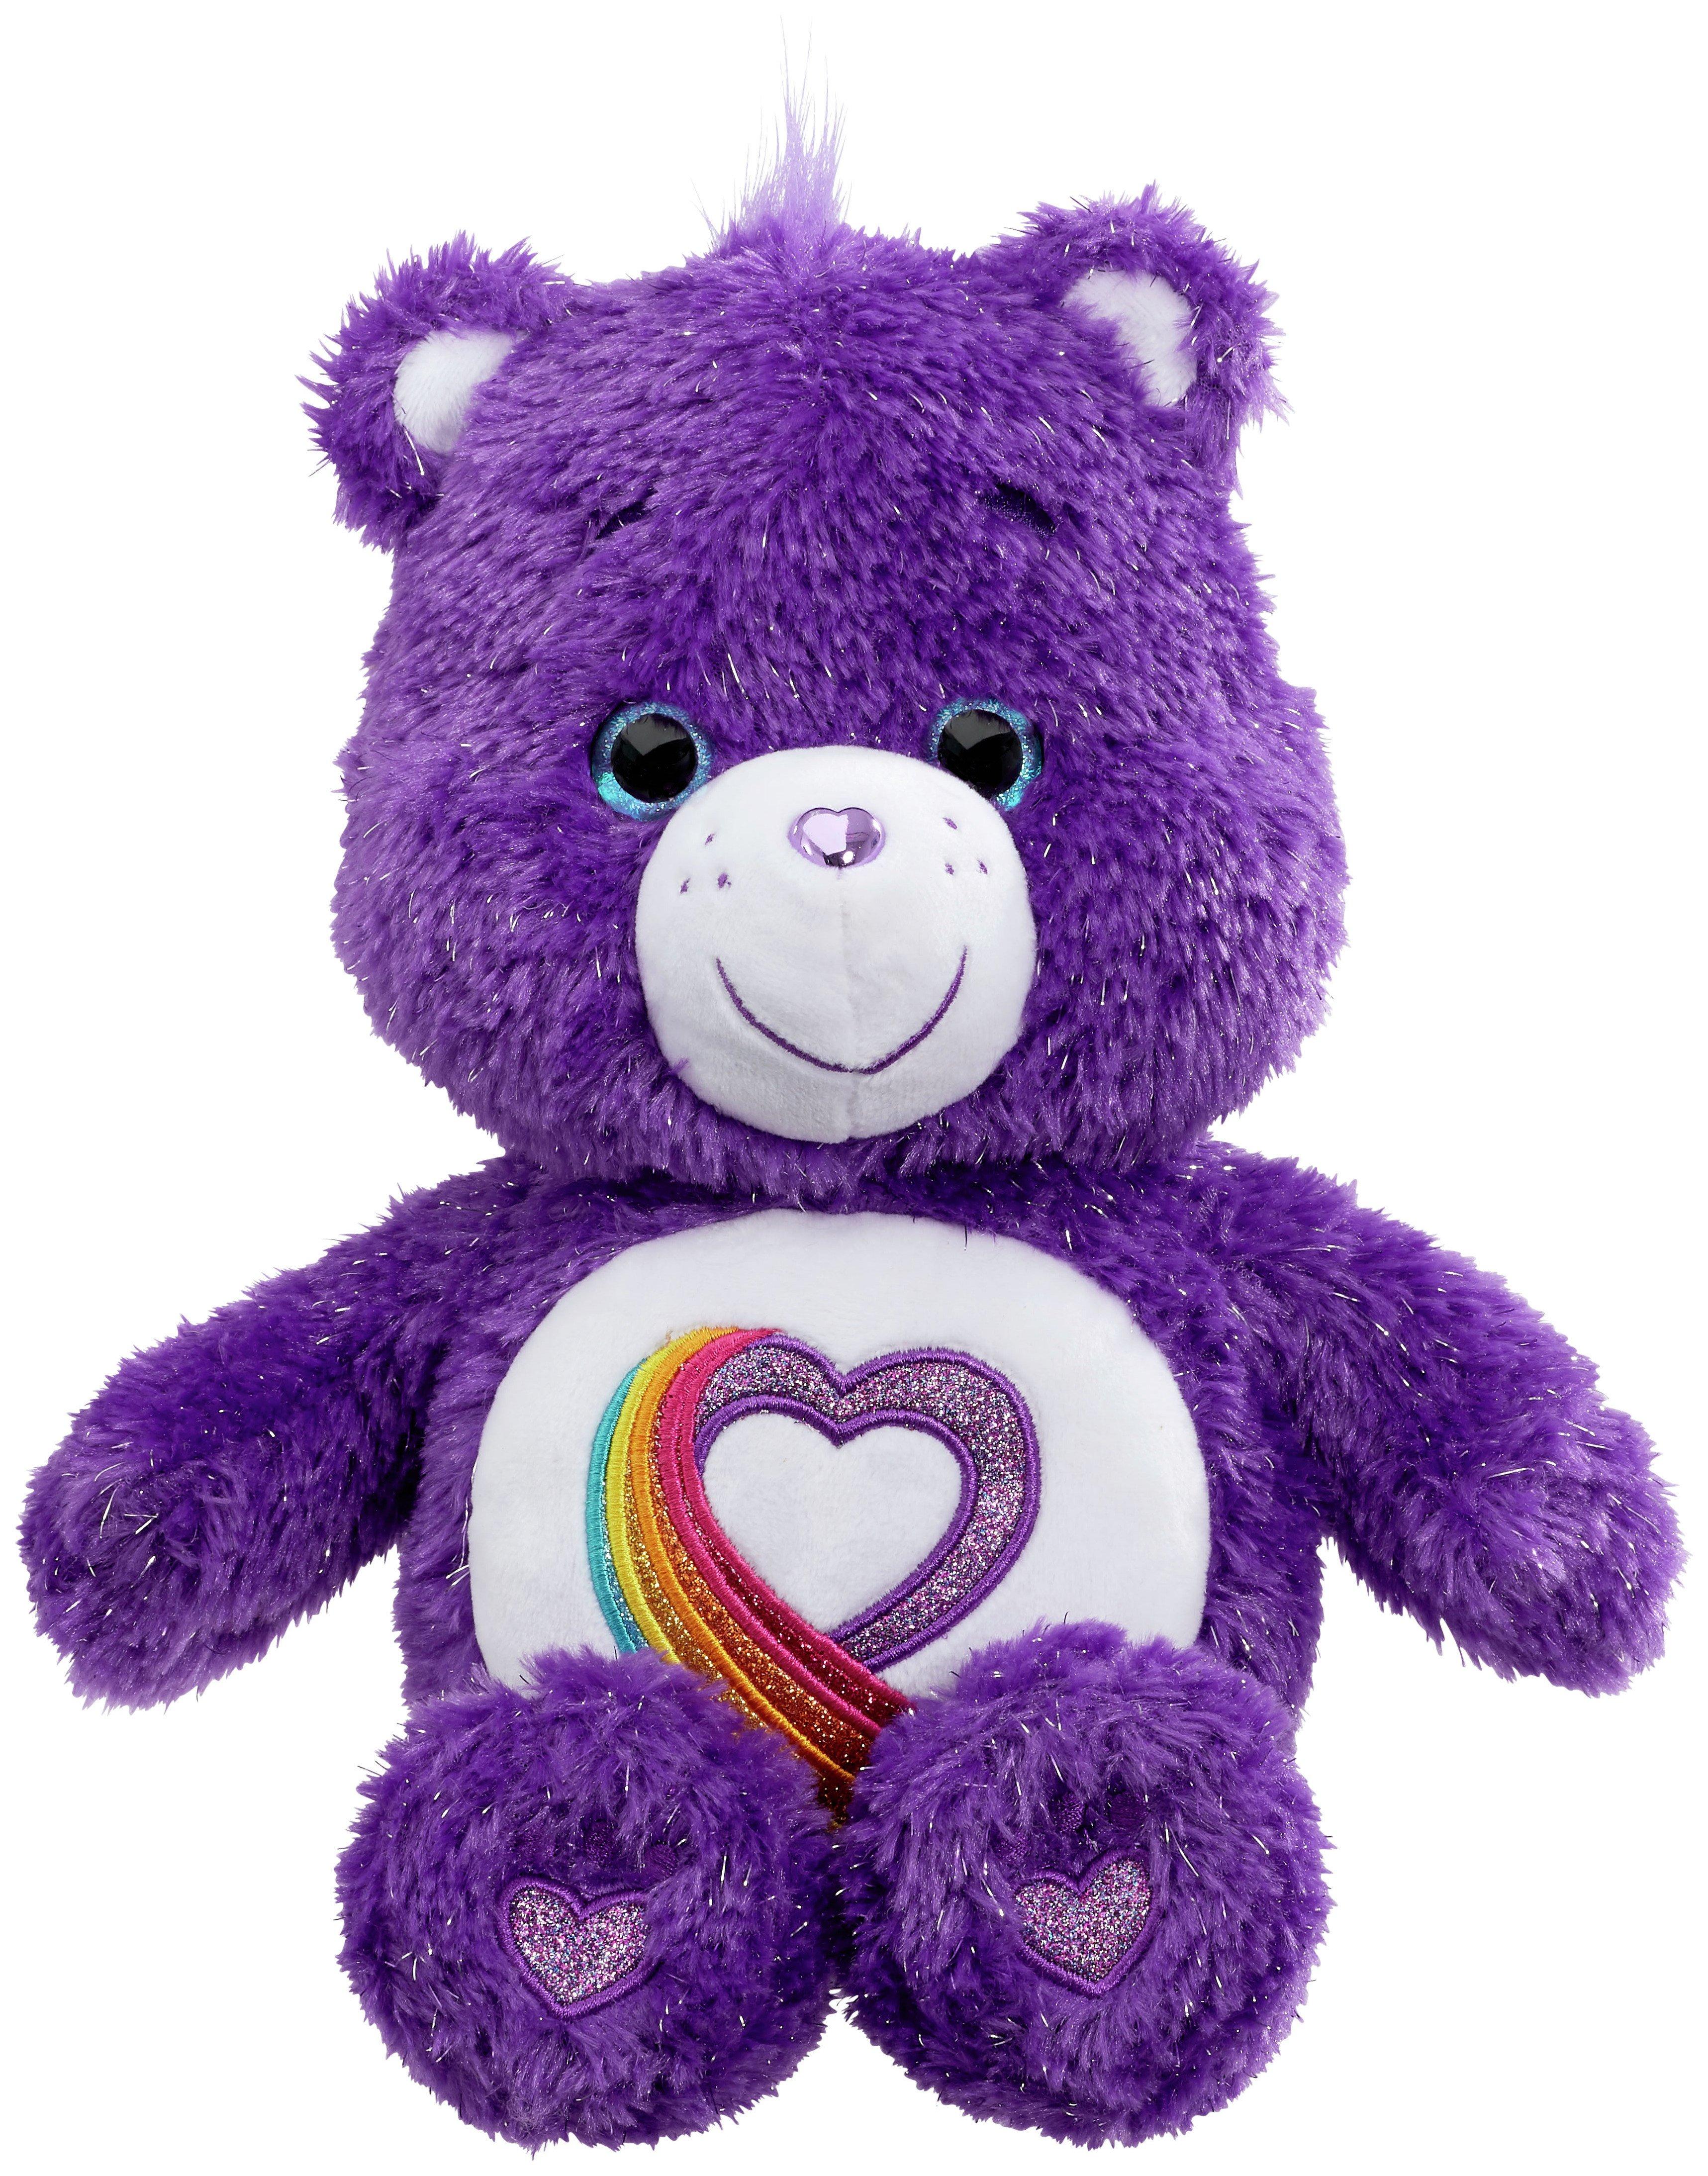 Image of Care Bears Rainbow Heart 35th Anniversary Bear.